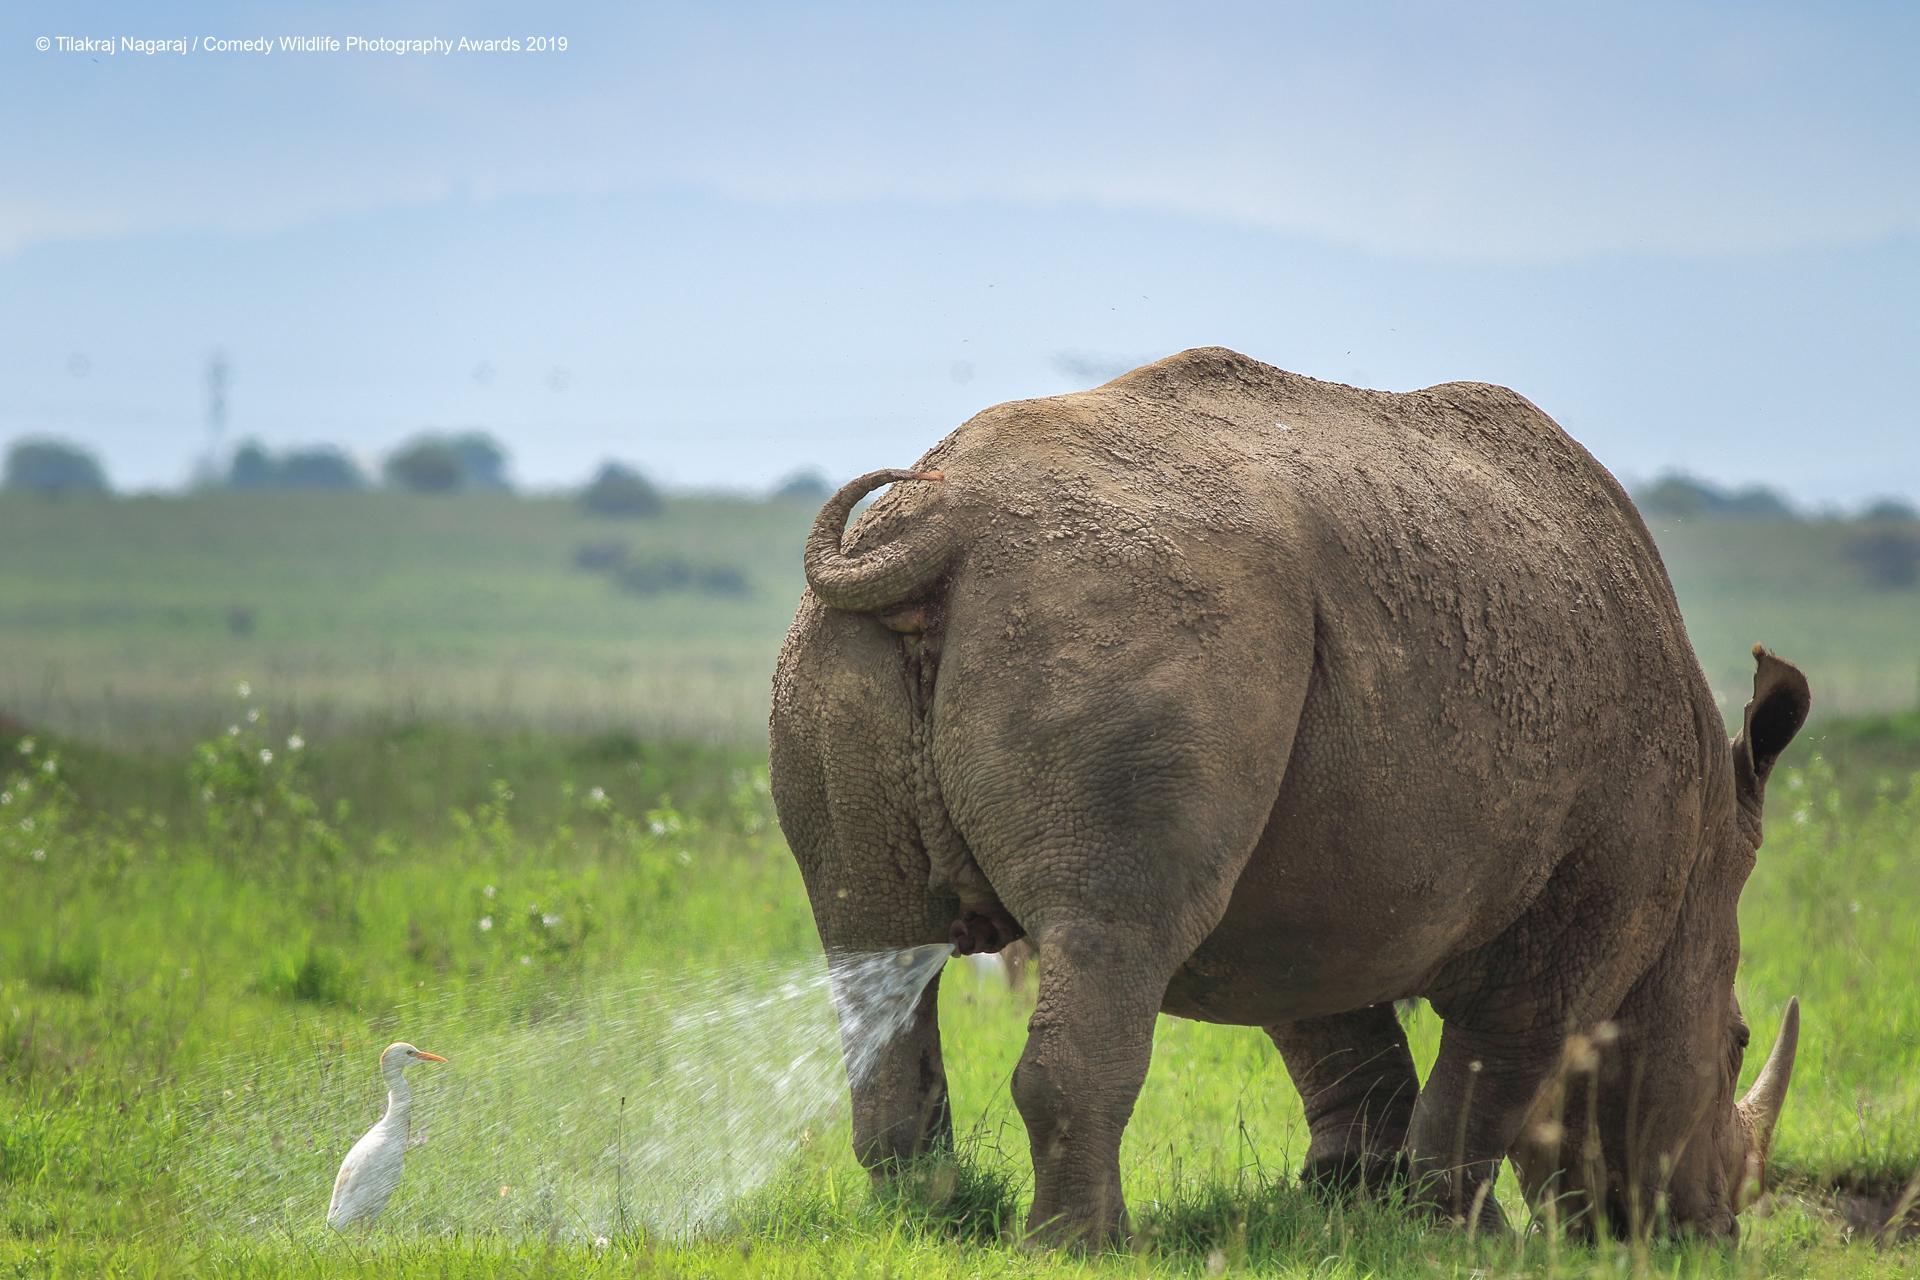 White rhino pissing on a Egret.